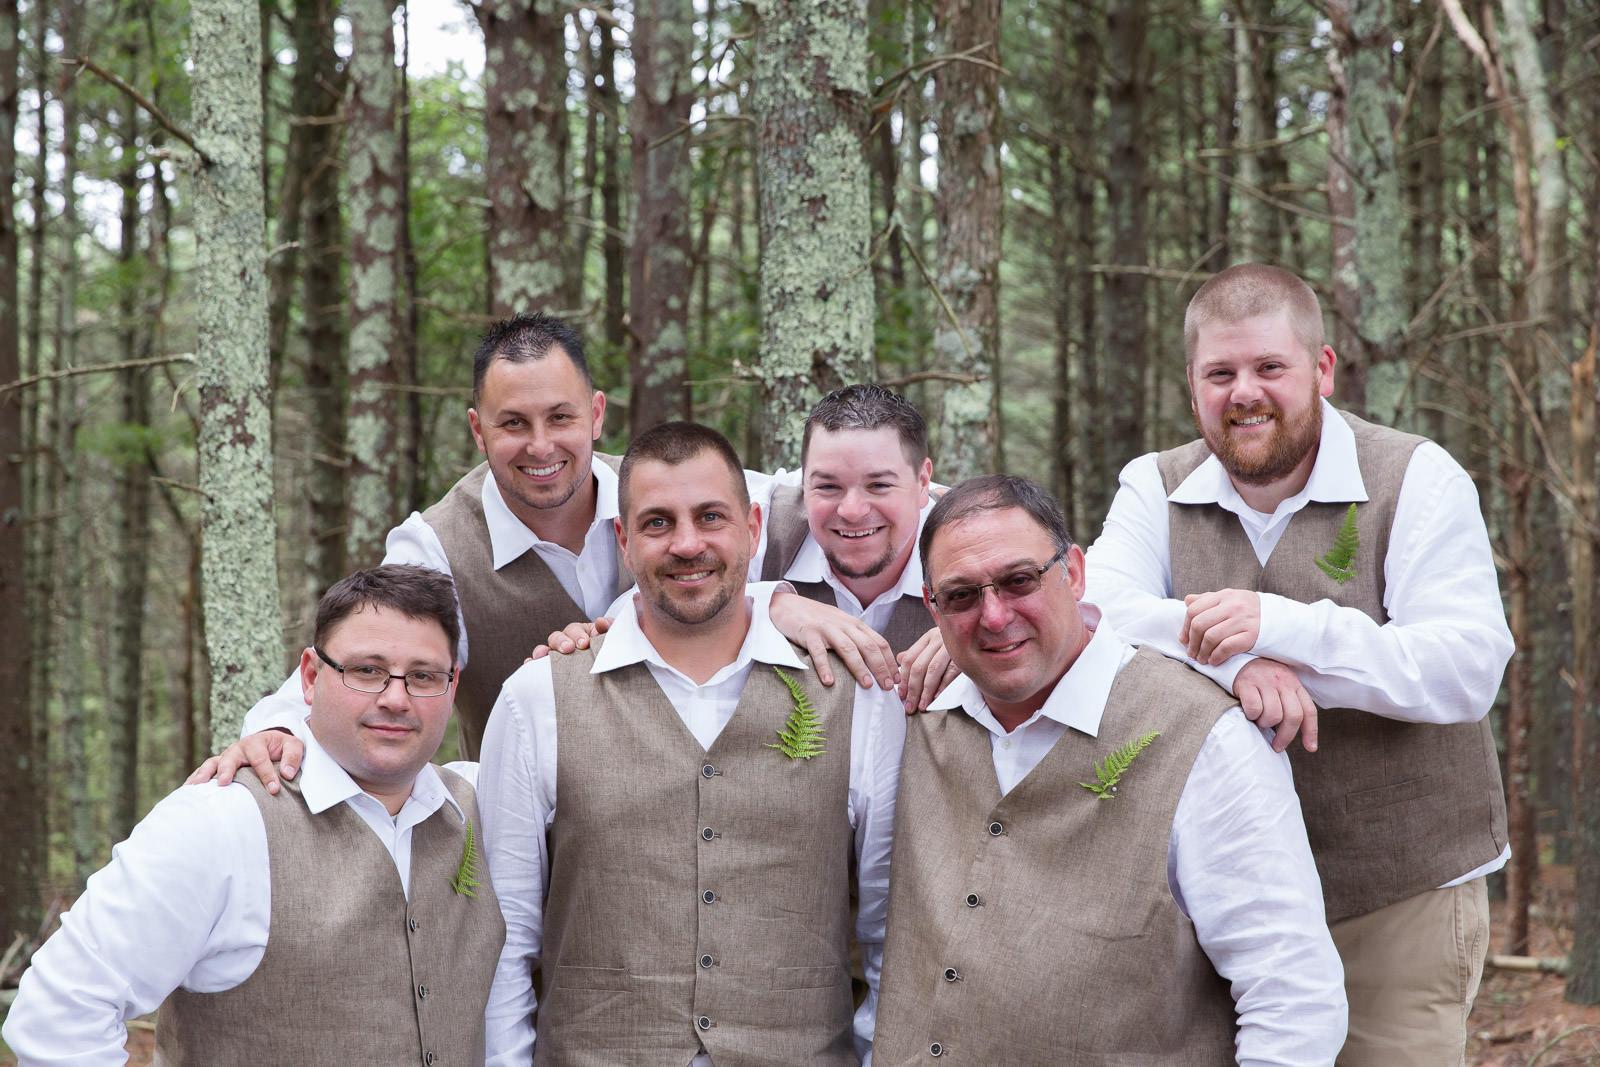 Coventry, Rhode Island, RI, Backyard Wedding, forest, earthy, wedding, tracy jenkins photography, wedding photographer, ri wedding photographer, Rhode Island Wedding photographer, grooms party, wedding party, fern boutonniere